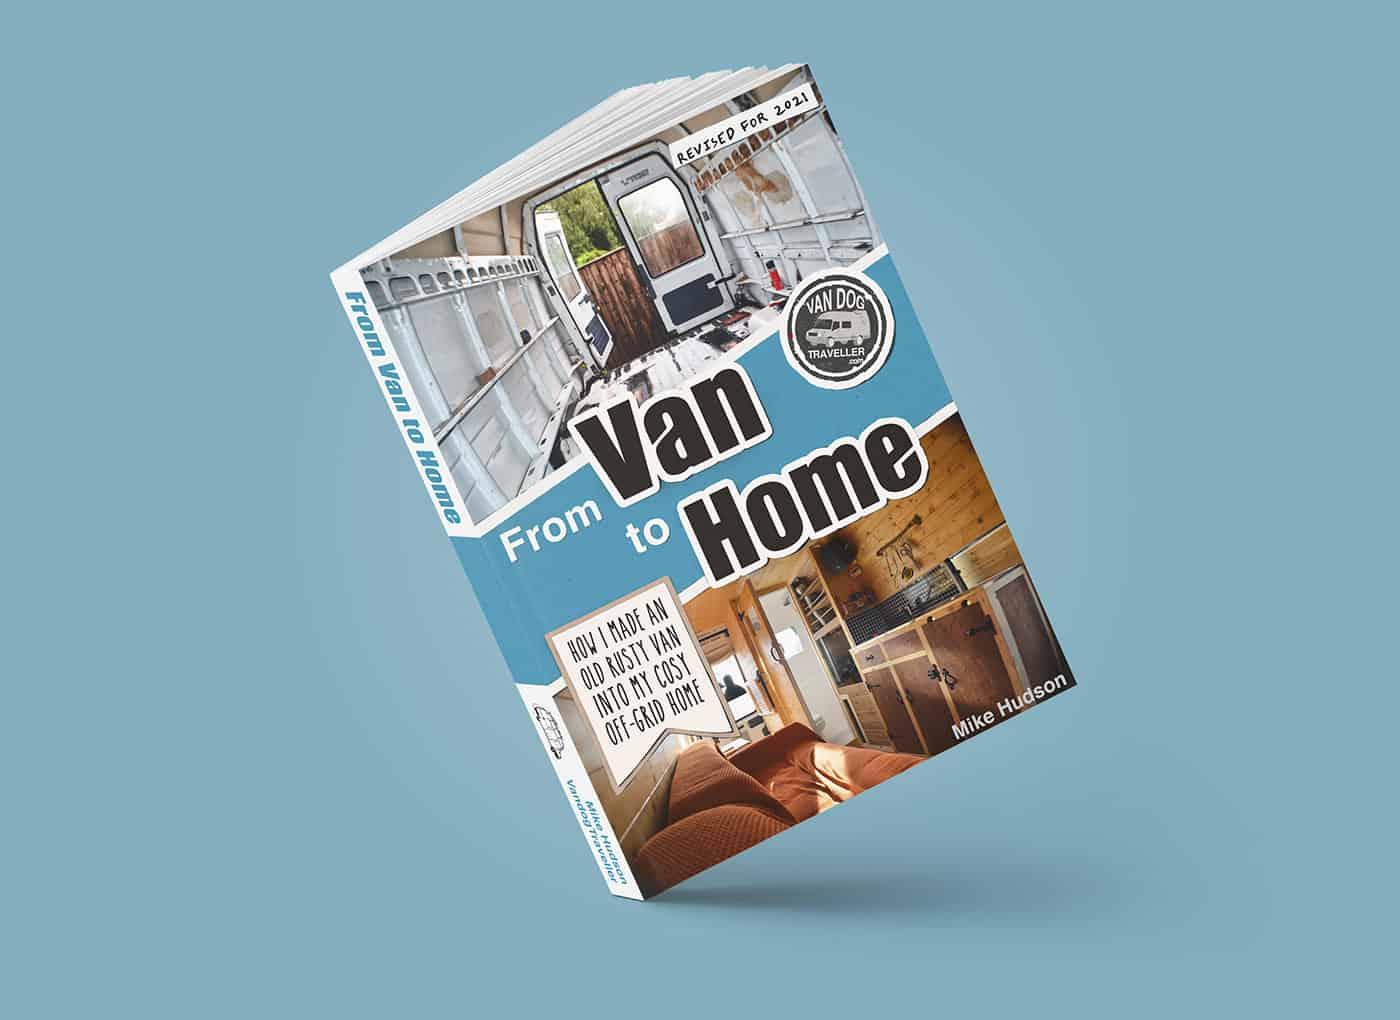 From Van to Home ebook –van conversion guide